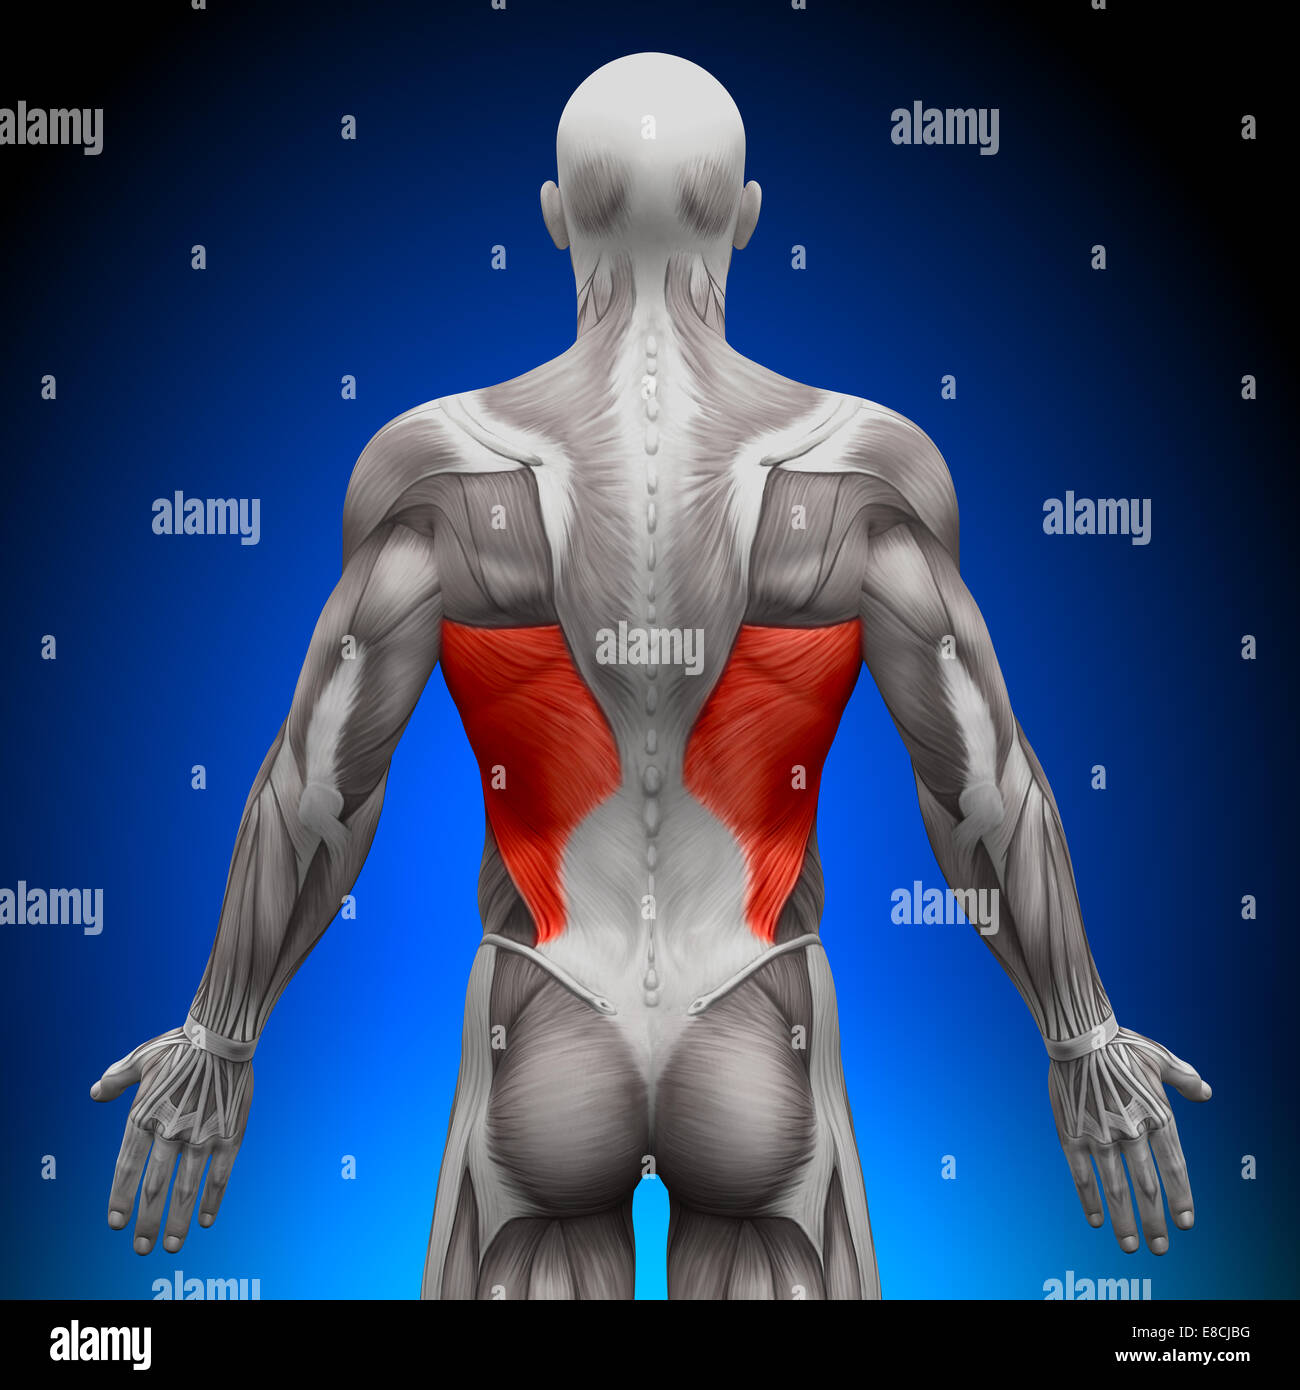 Latissimus Dorsi - Anatomie Muskeln Stockfoto, Bild: 74036580 - Alamy